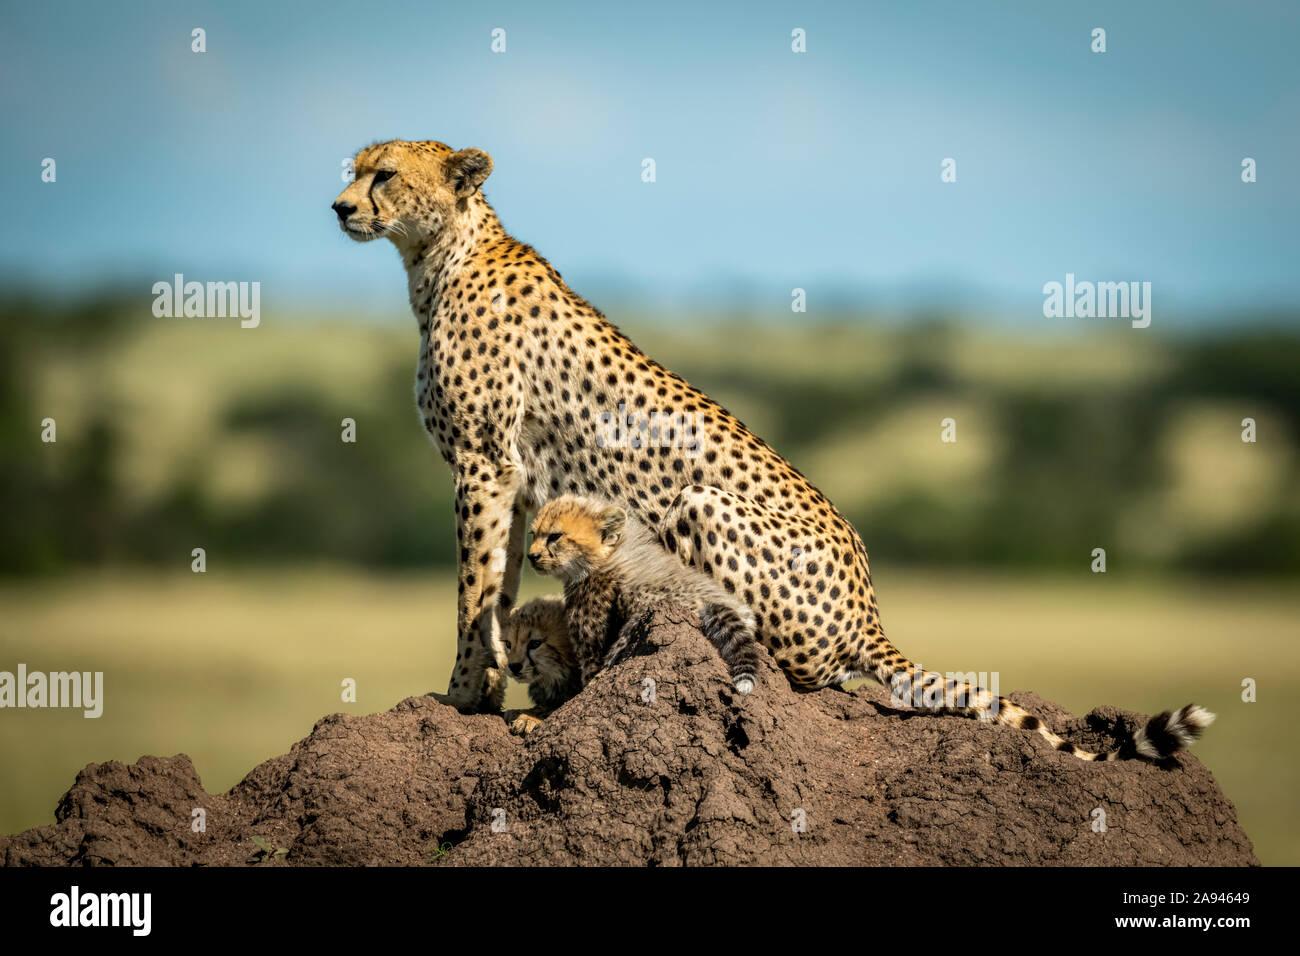 Cheetah (Acinonyx jubatus) with two cubs on termite mound in profile, Grumeti Serengeti Tented Camp, Serengeti National Park; Tanzania Stock Photo